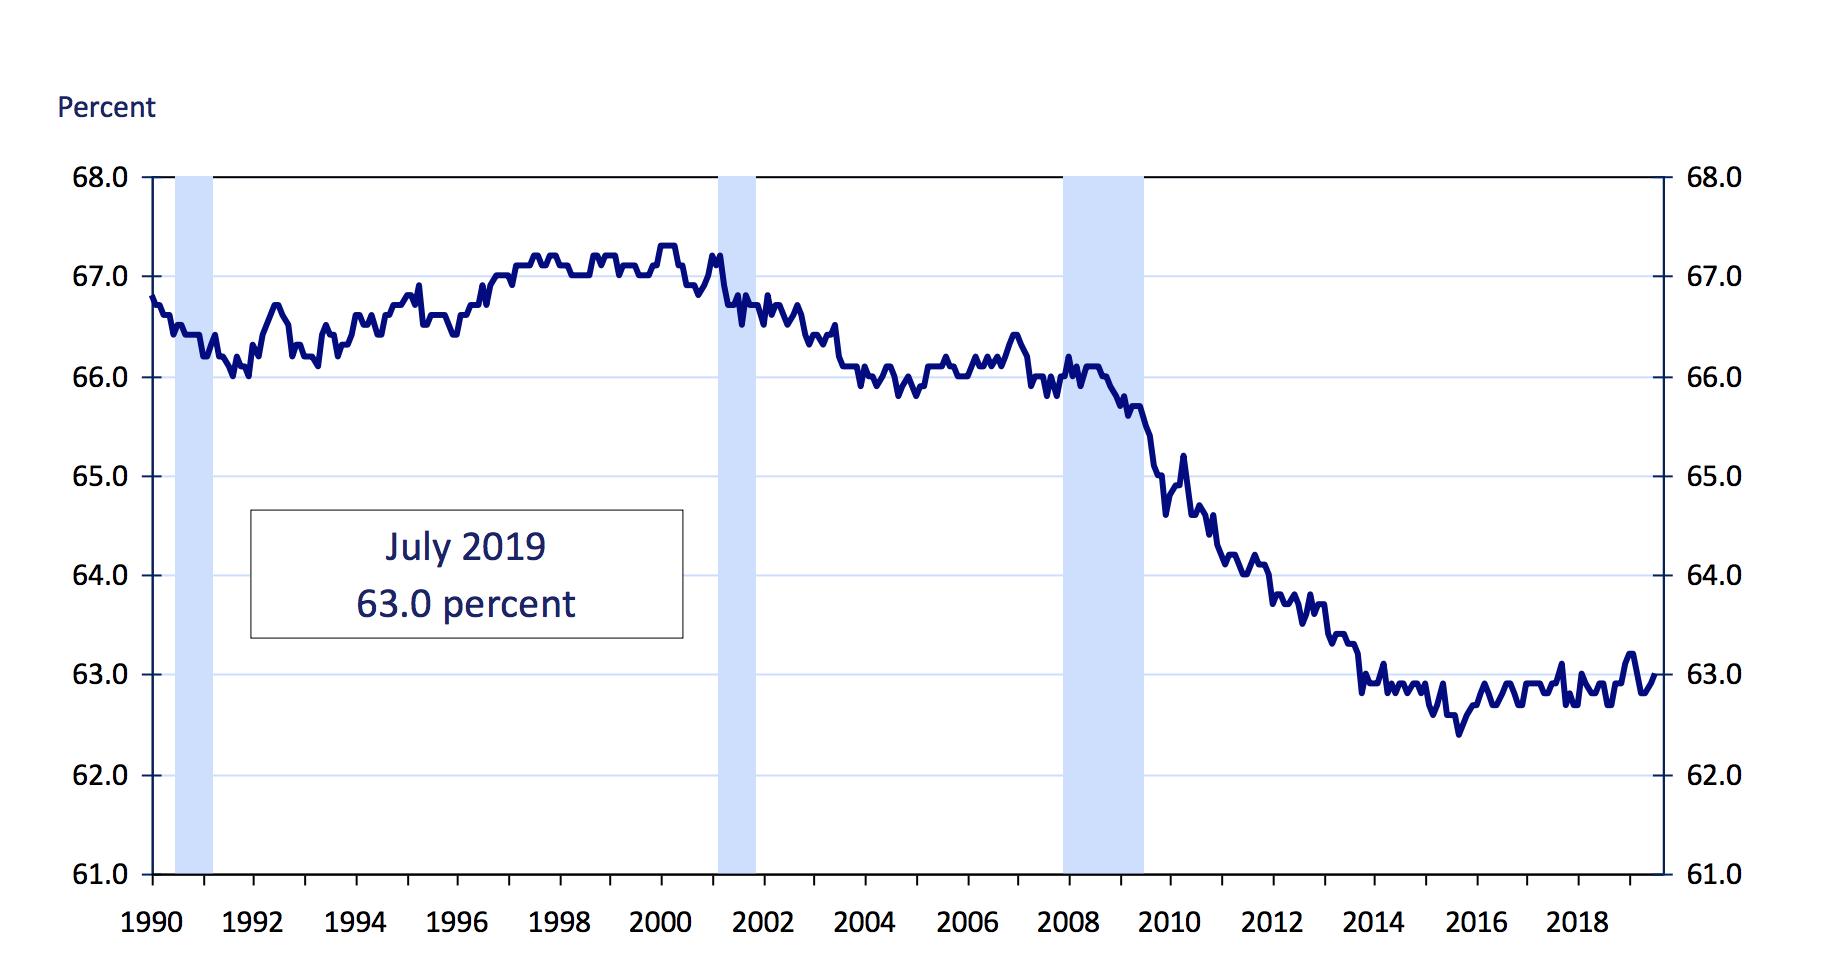 labor force participation rate, Bureau of Labor Statistics